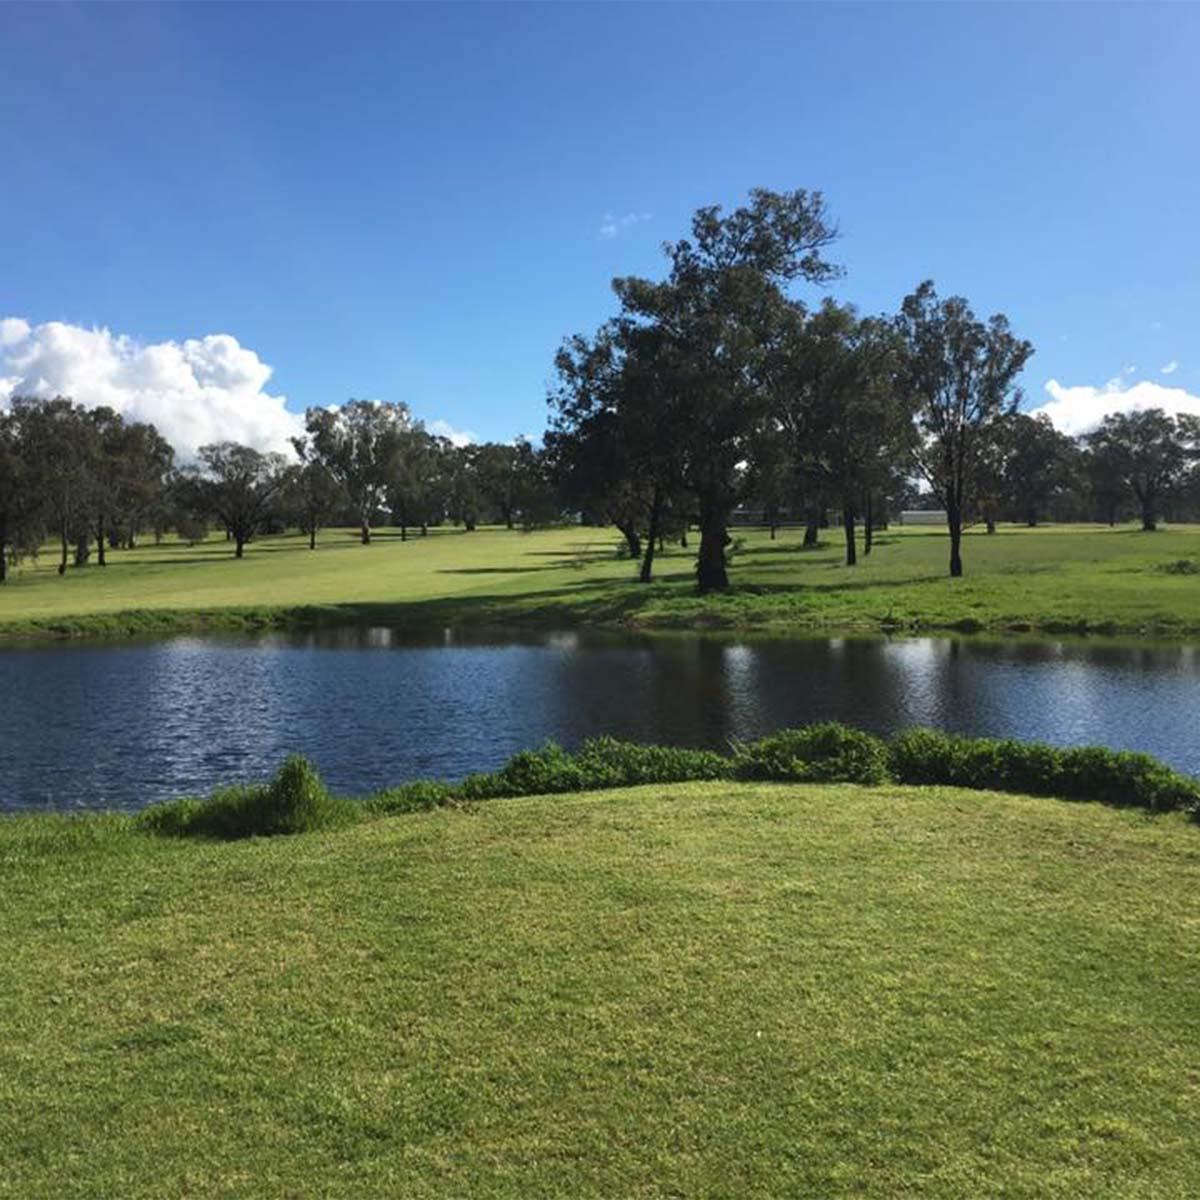 scene overlooking a dam on Barraba Golf Club